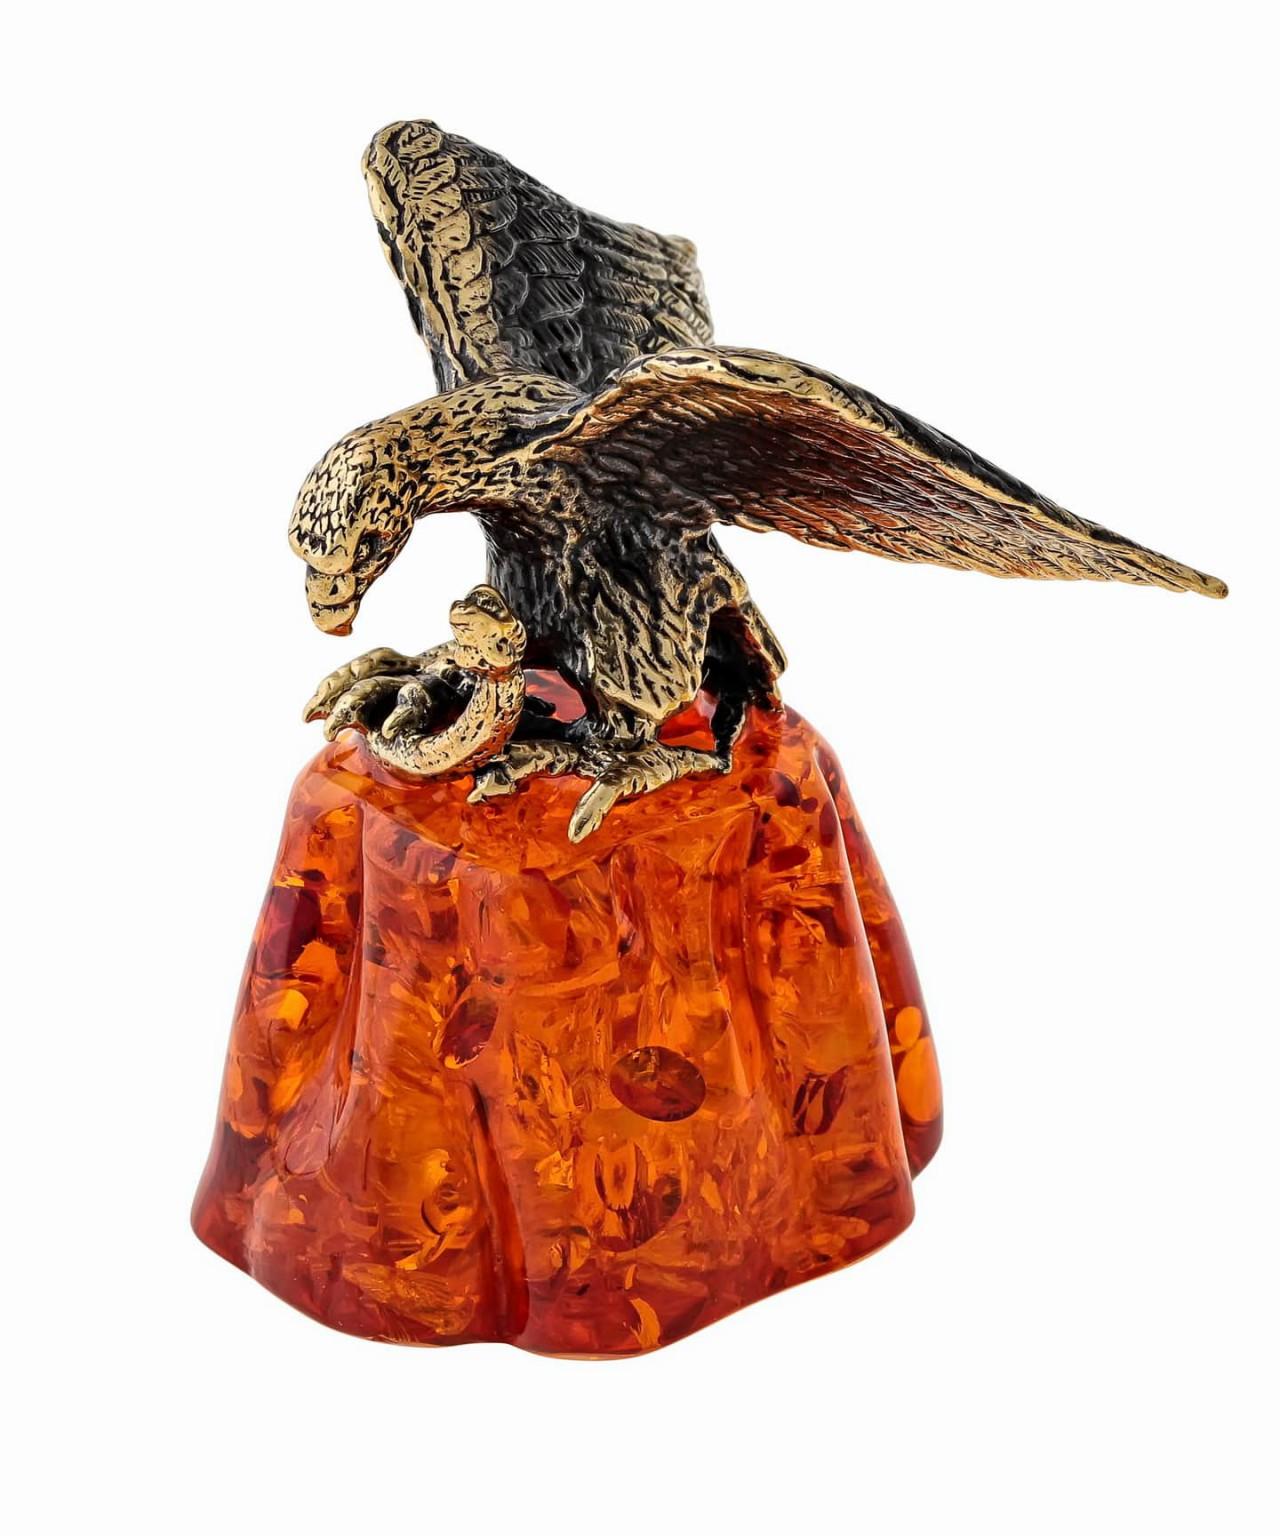 Птица Орел на скале со змеёй 1176